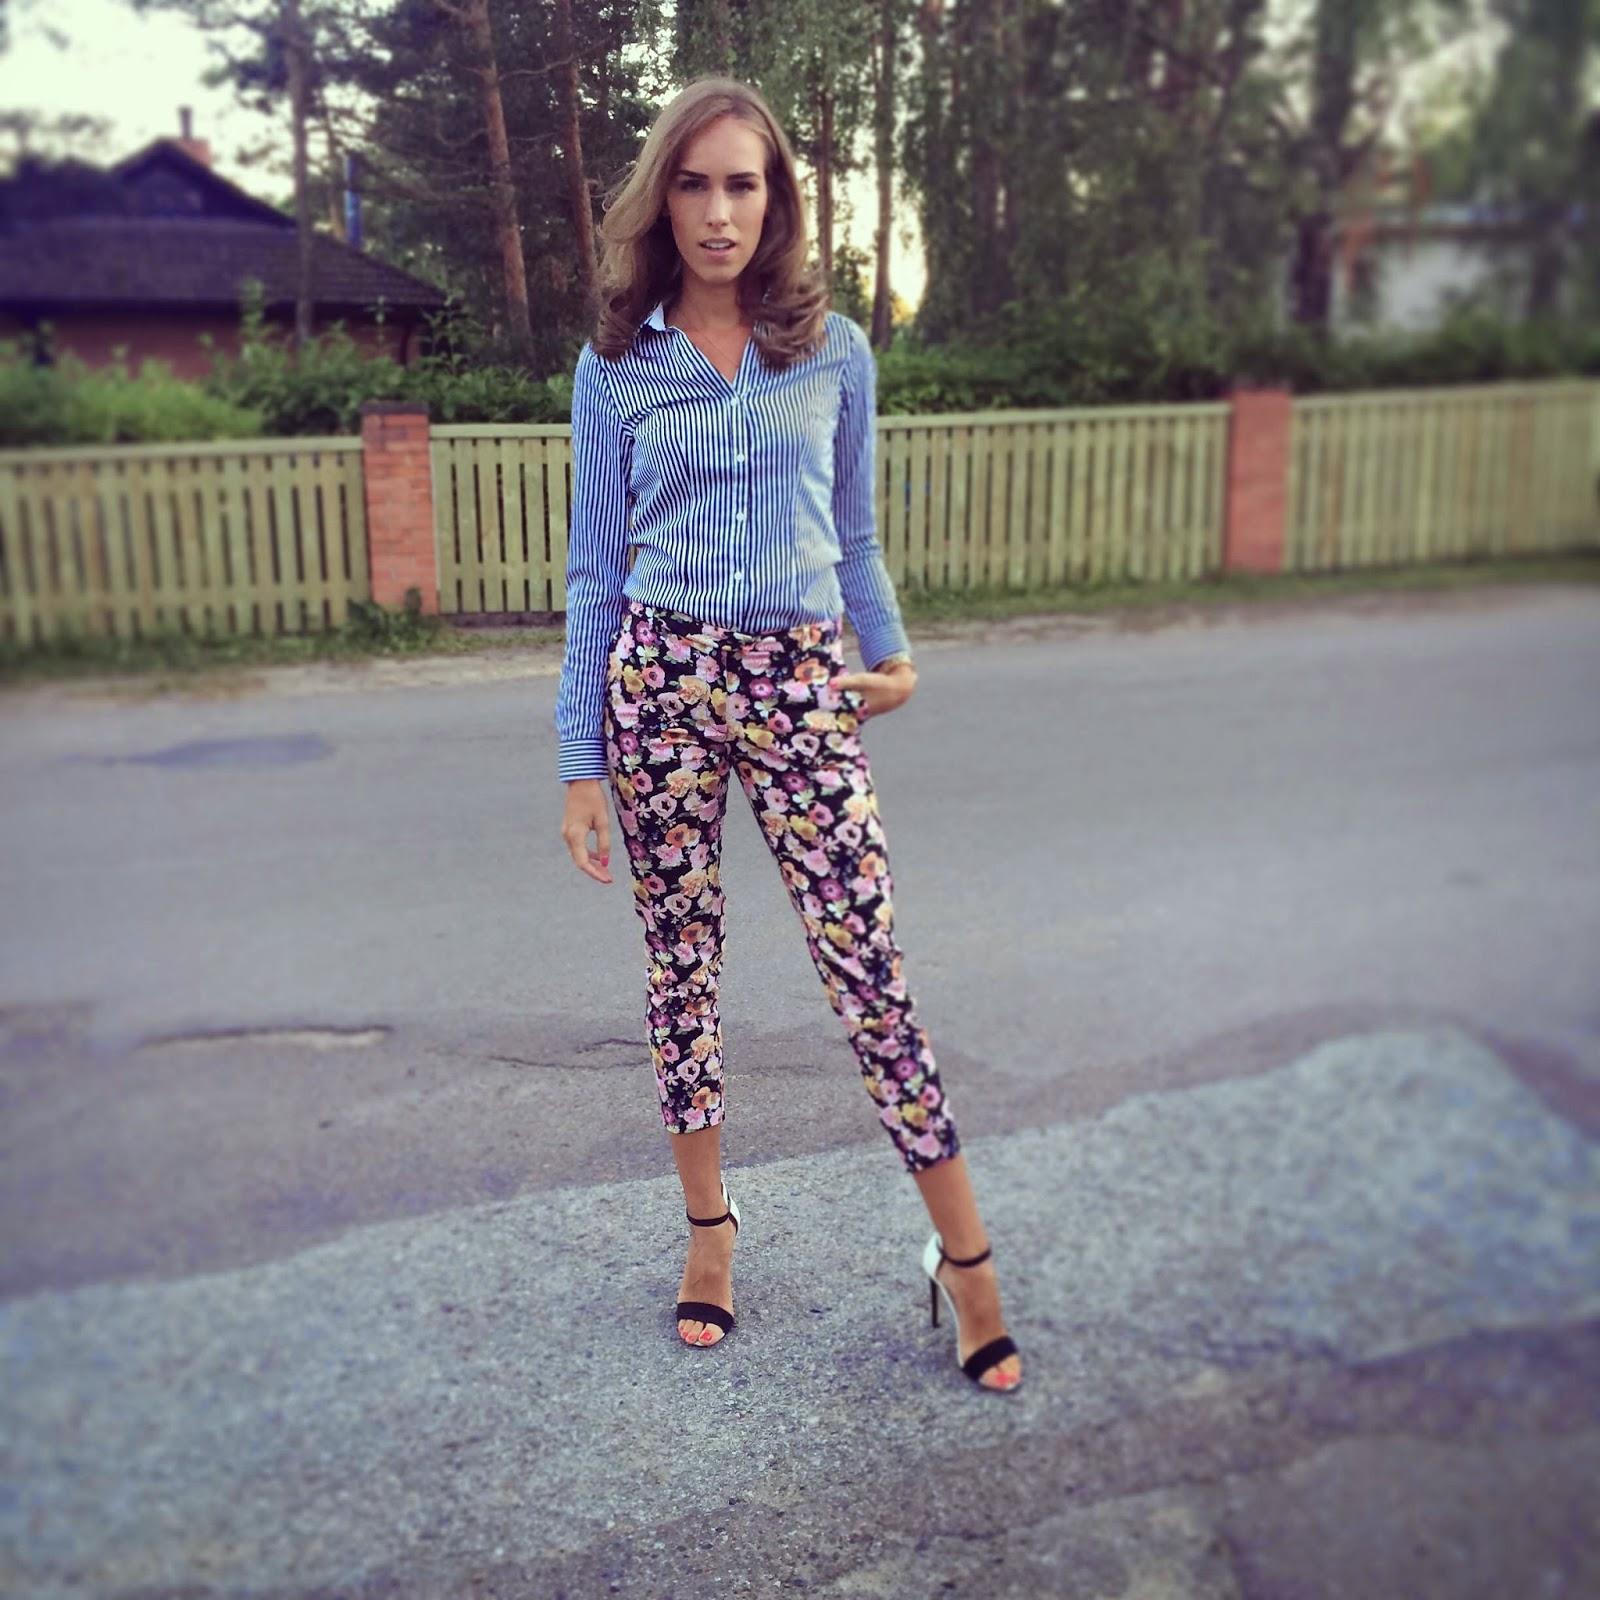 hm striped button up shirt floral ankle pants